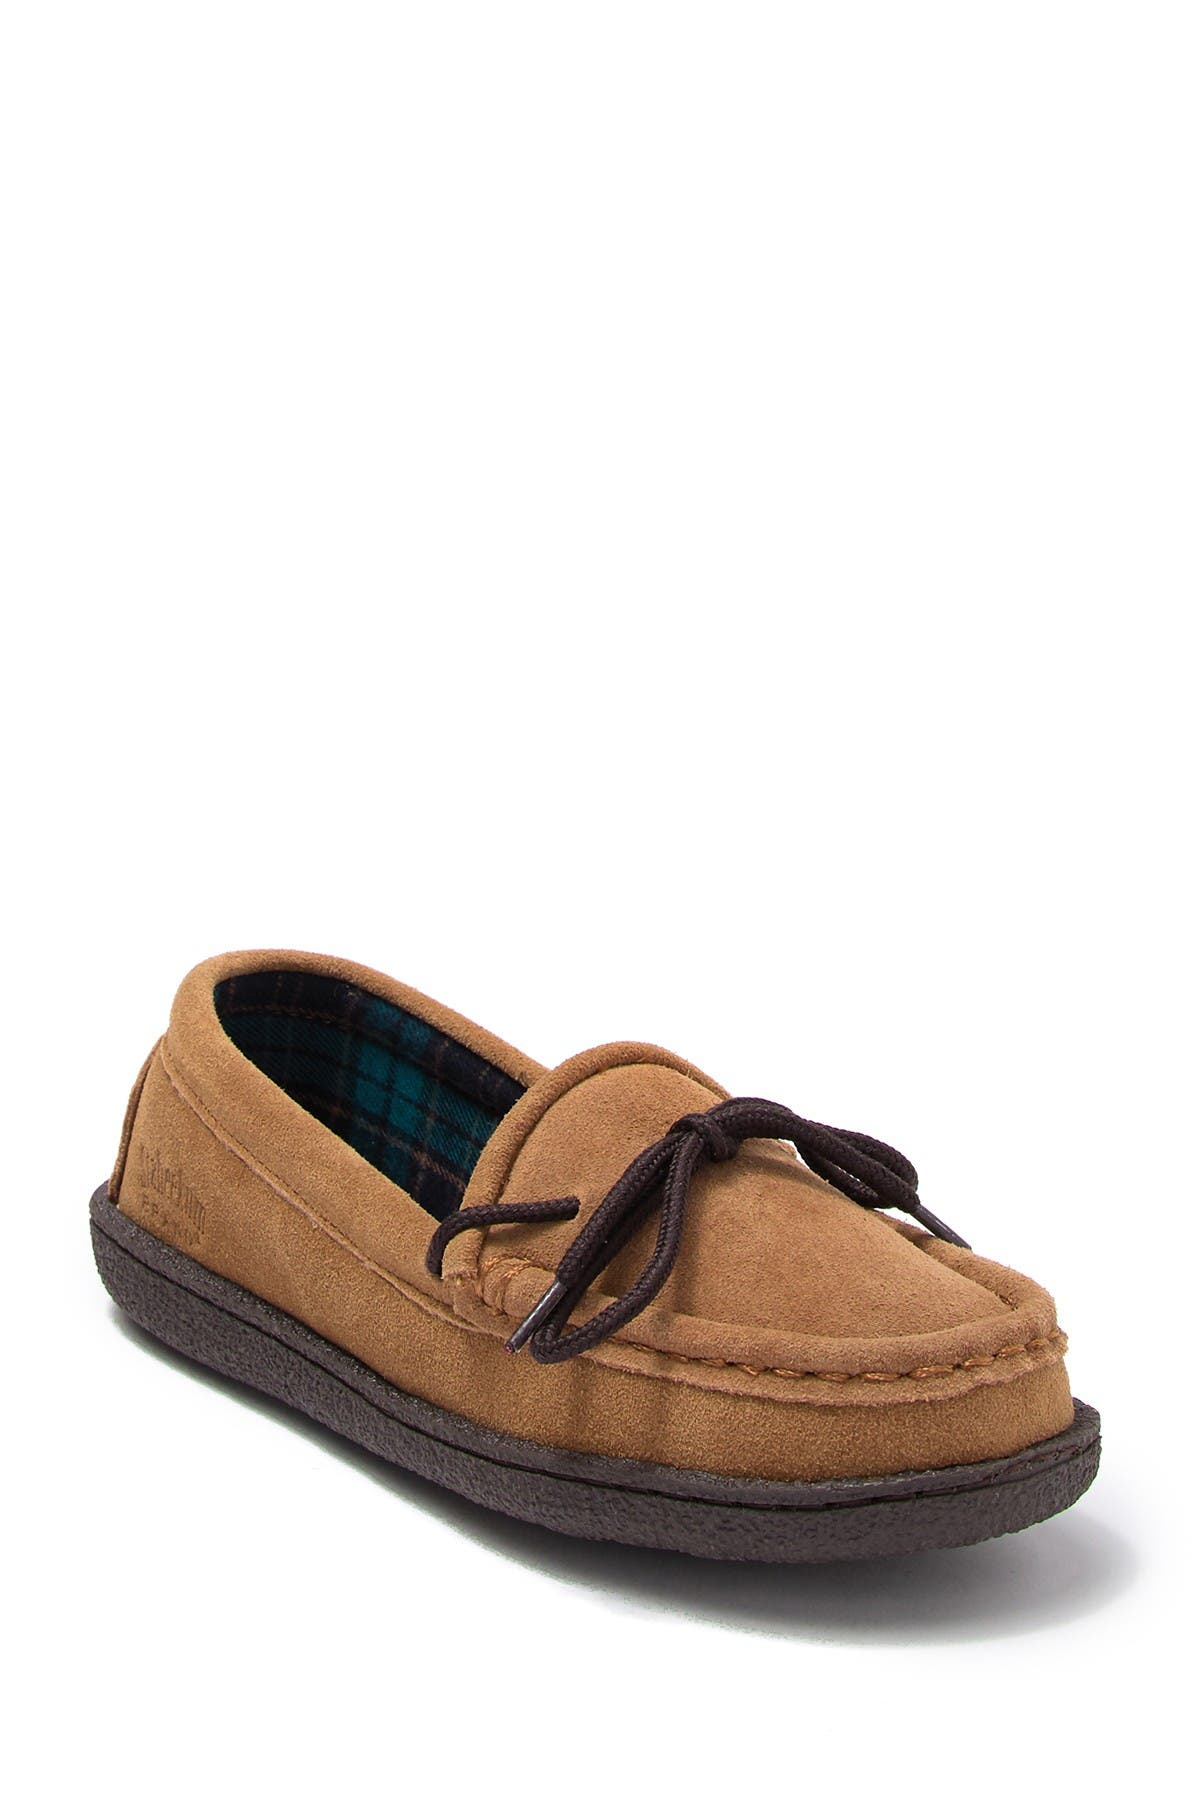 Image of STAHEEKUM Eden Suede Flannel Loafer